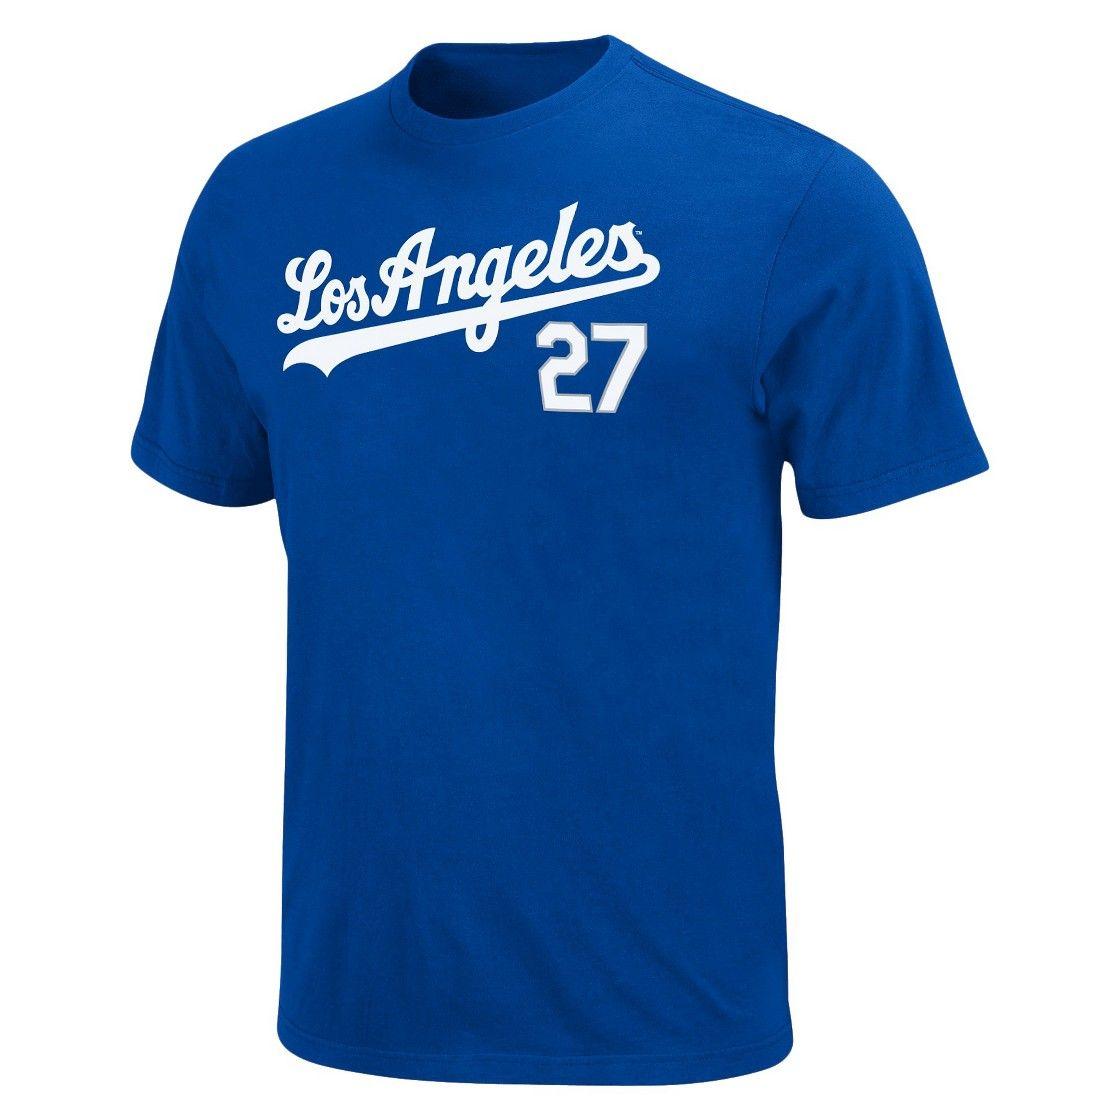 Los Angeles Dodgers Matt Kemp Men's T-Shirt Blue